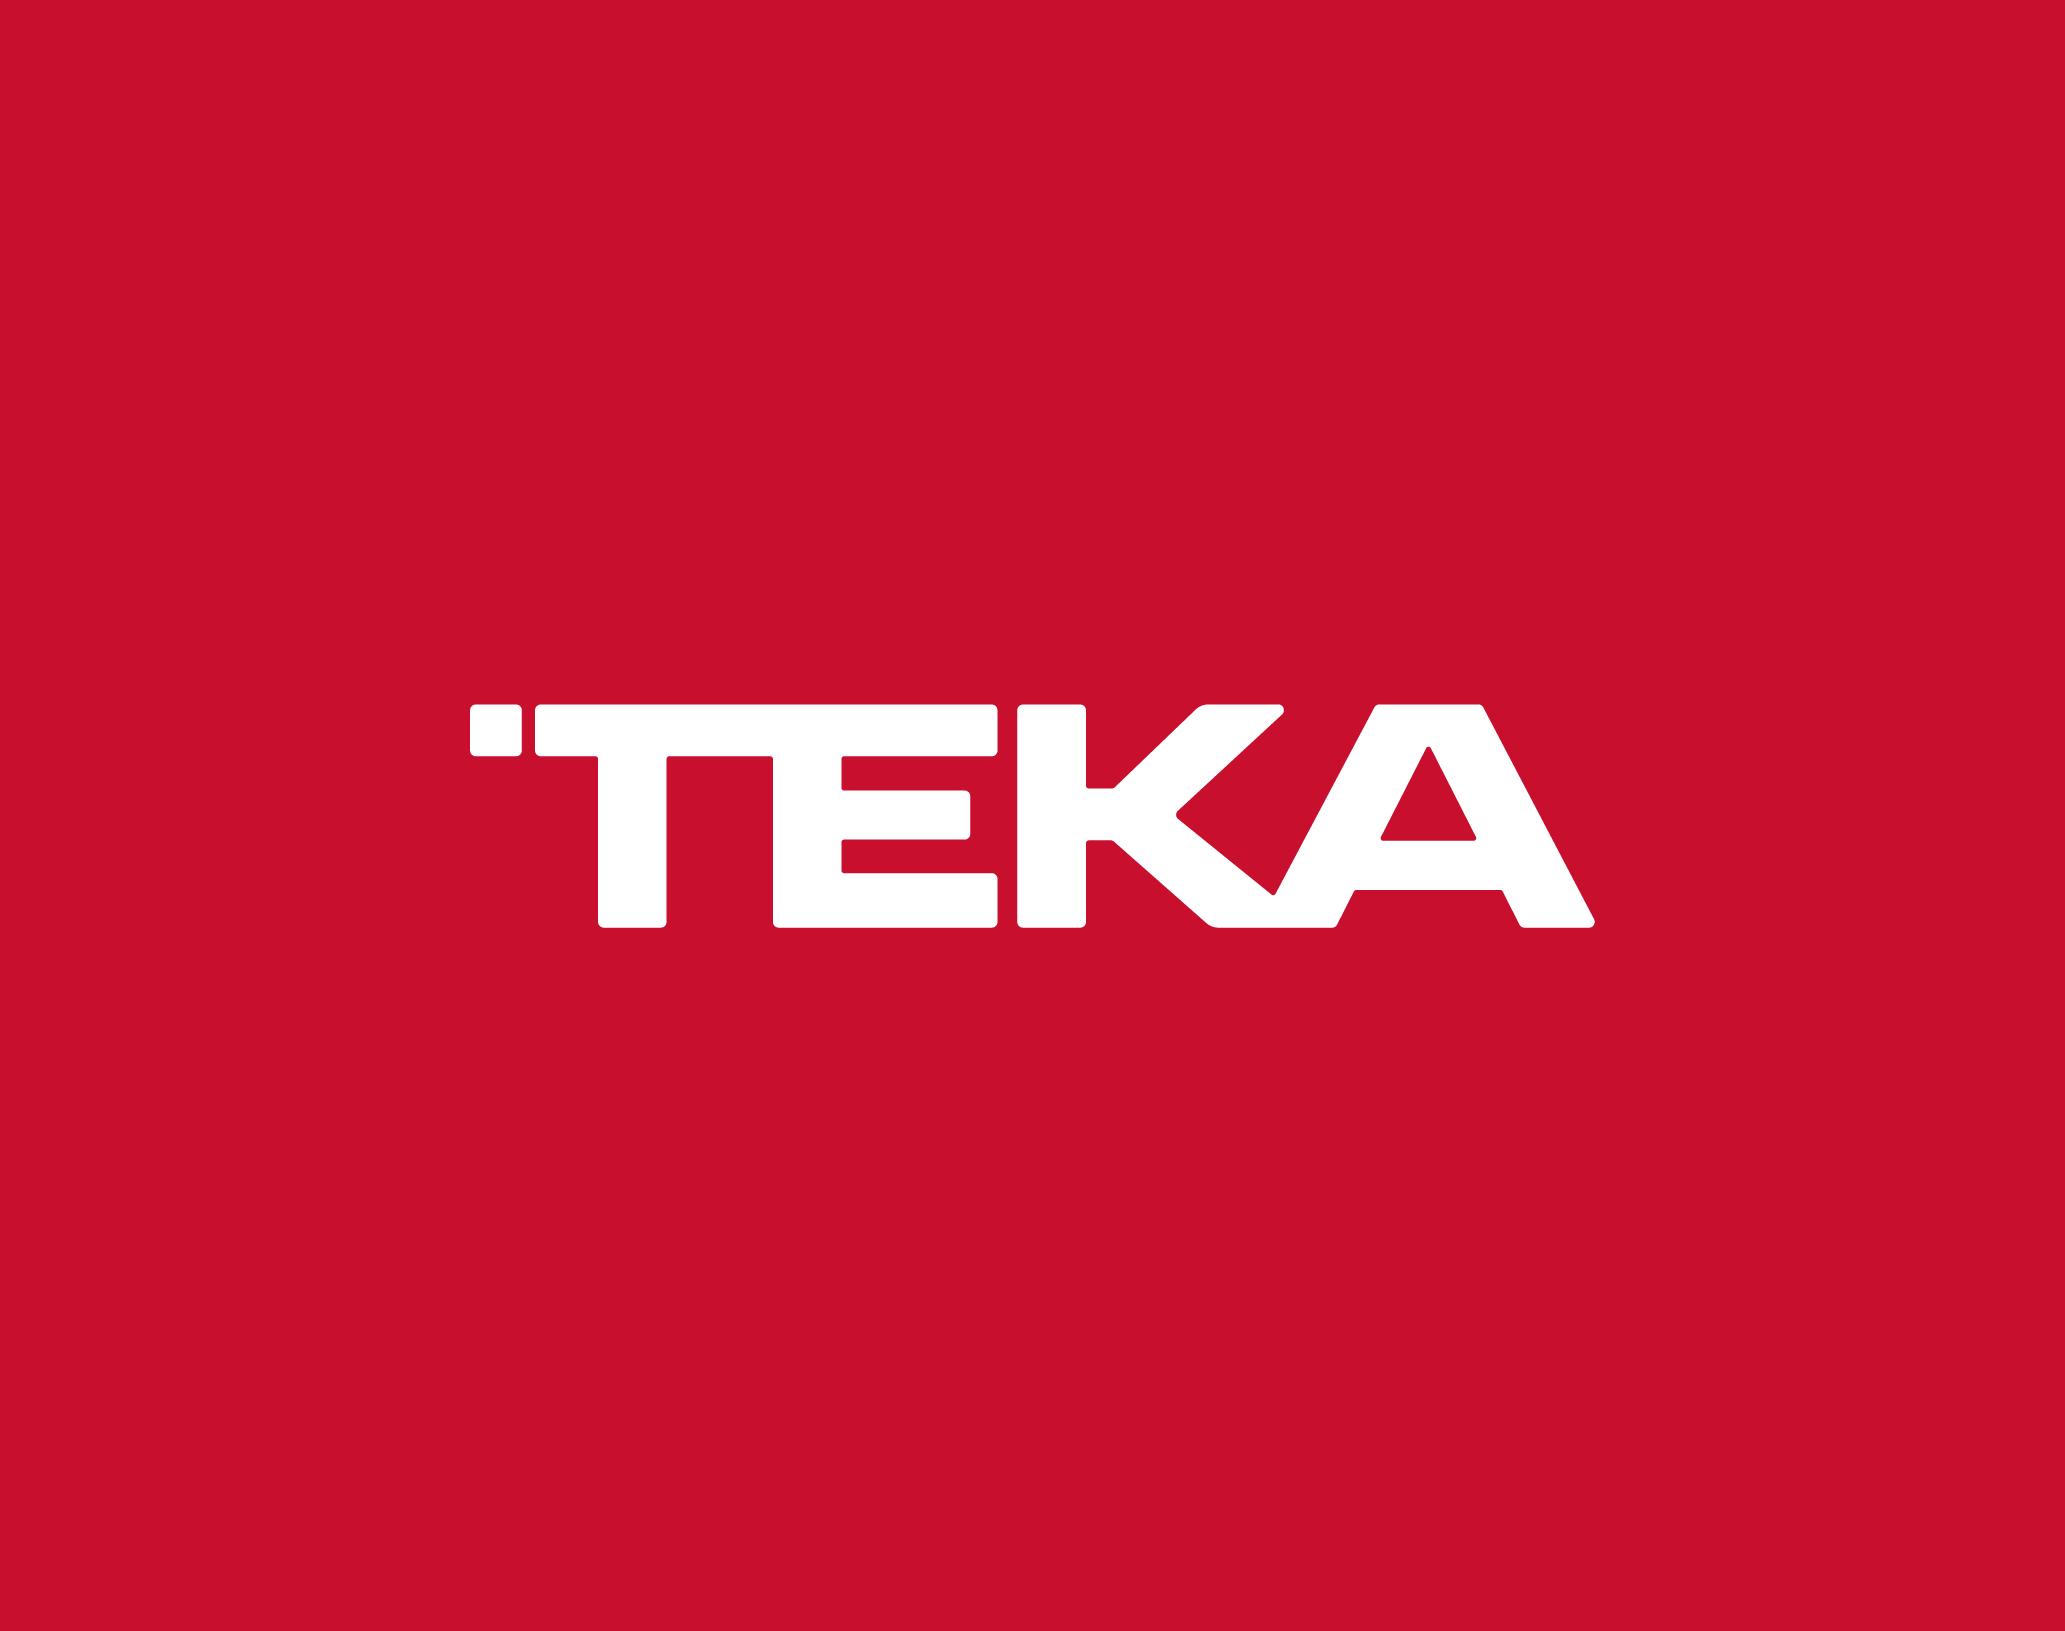 Teka new logo 8a695145 6121 4923 9d86 0e77b53c5409